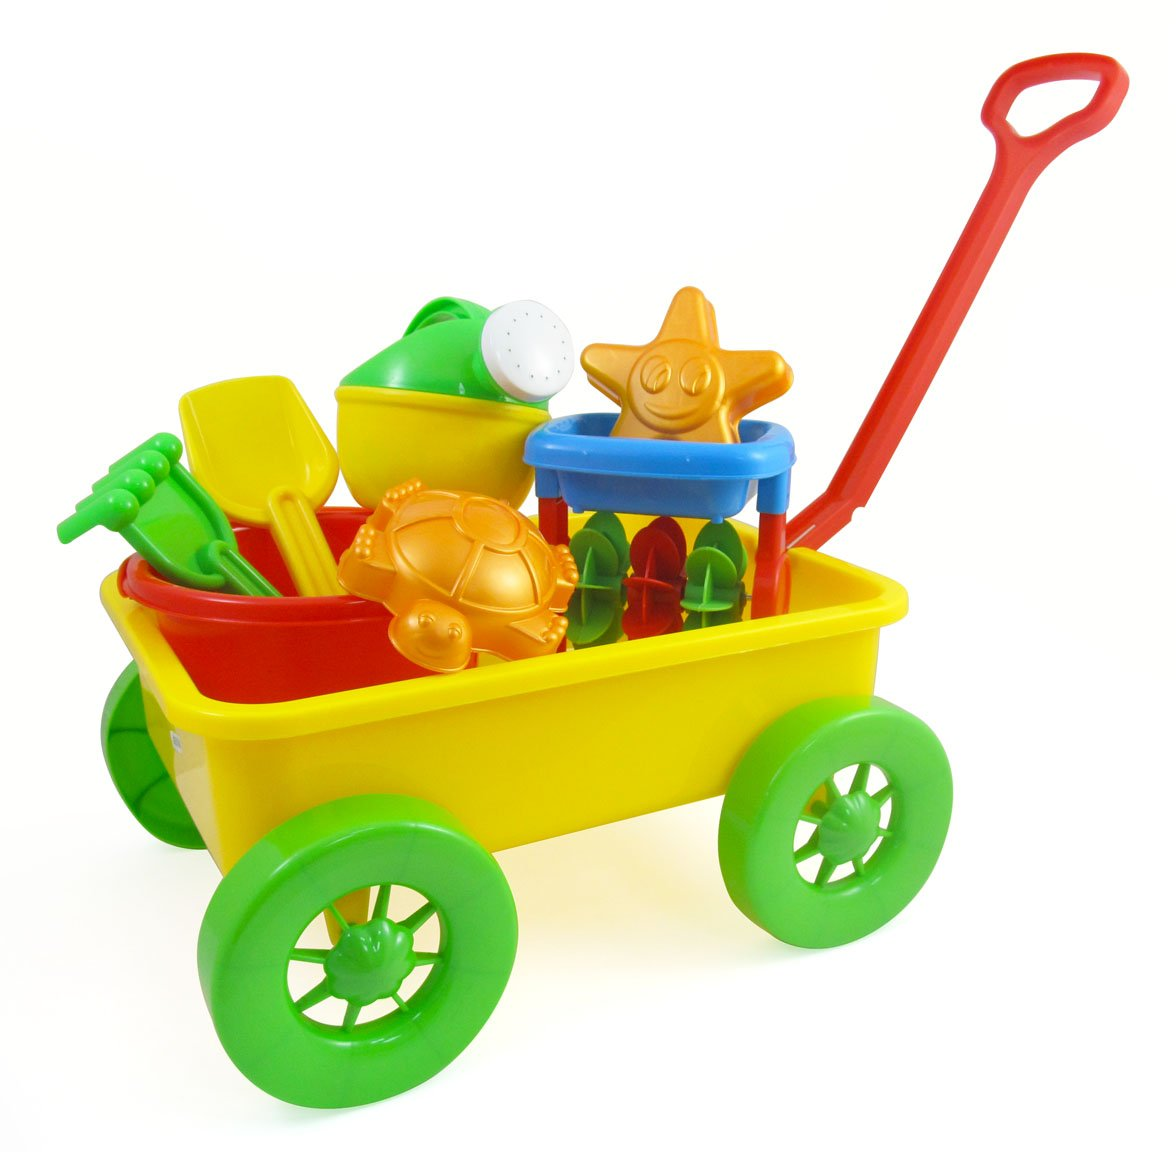 Toys For Beach : Beach toy wagon set sandbox toys sand wheel bucket shovel